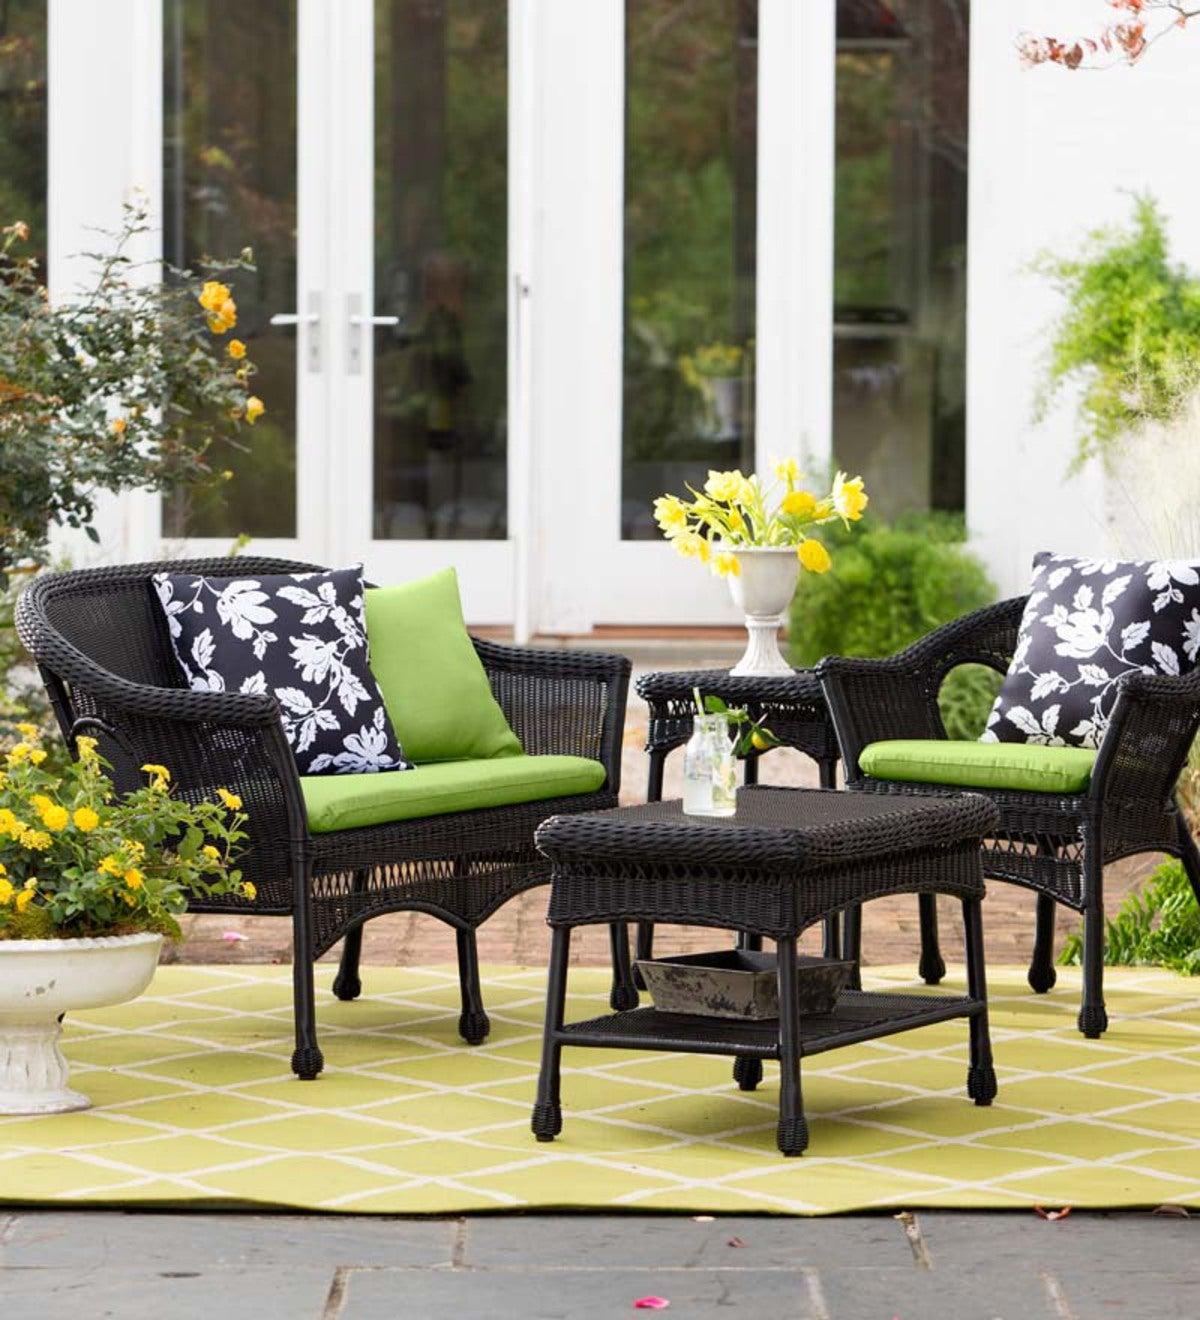 Black Easy Care Resin Wicker Furniture